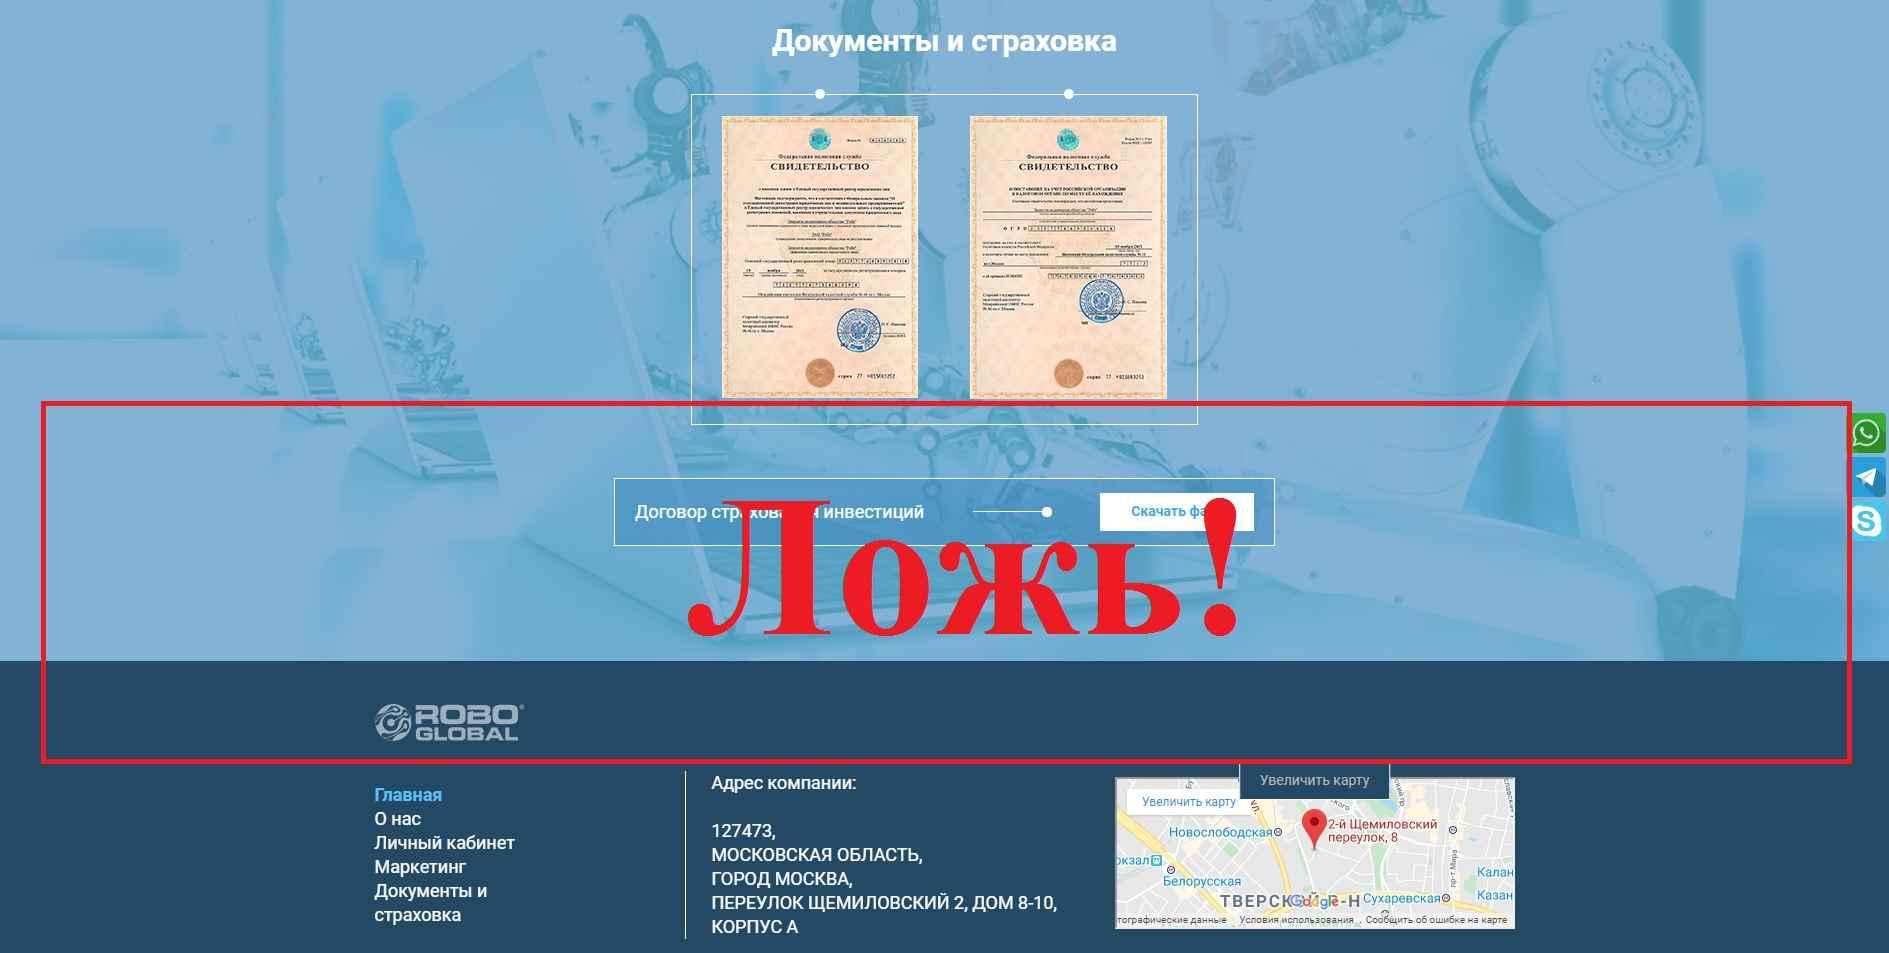 Robo Global – отзывы и репутация roboglobal.ru